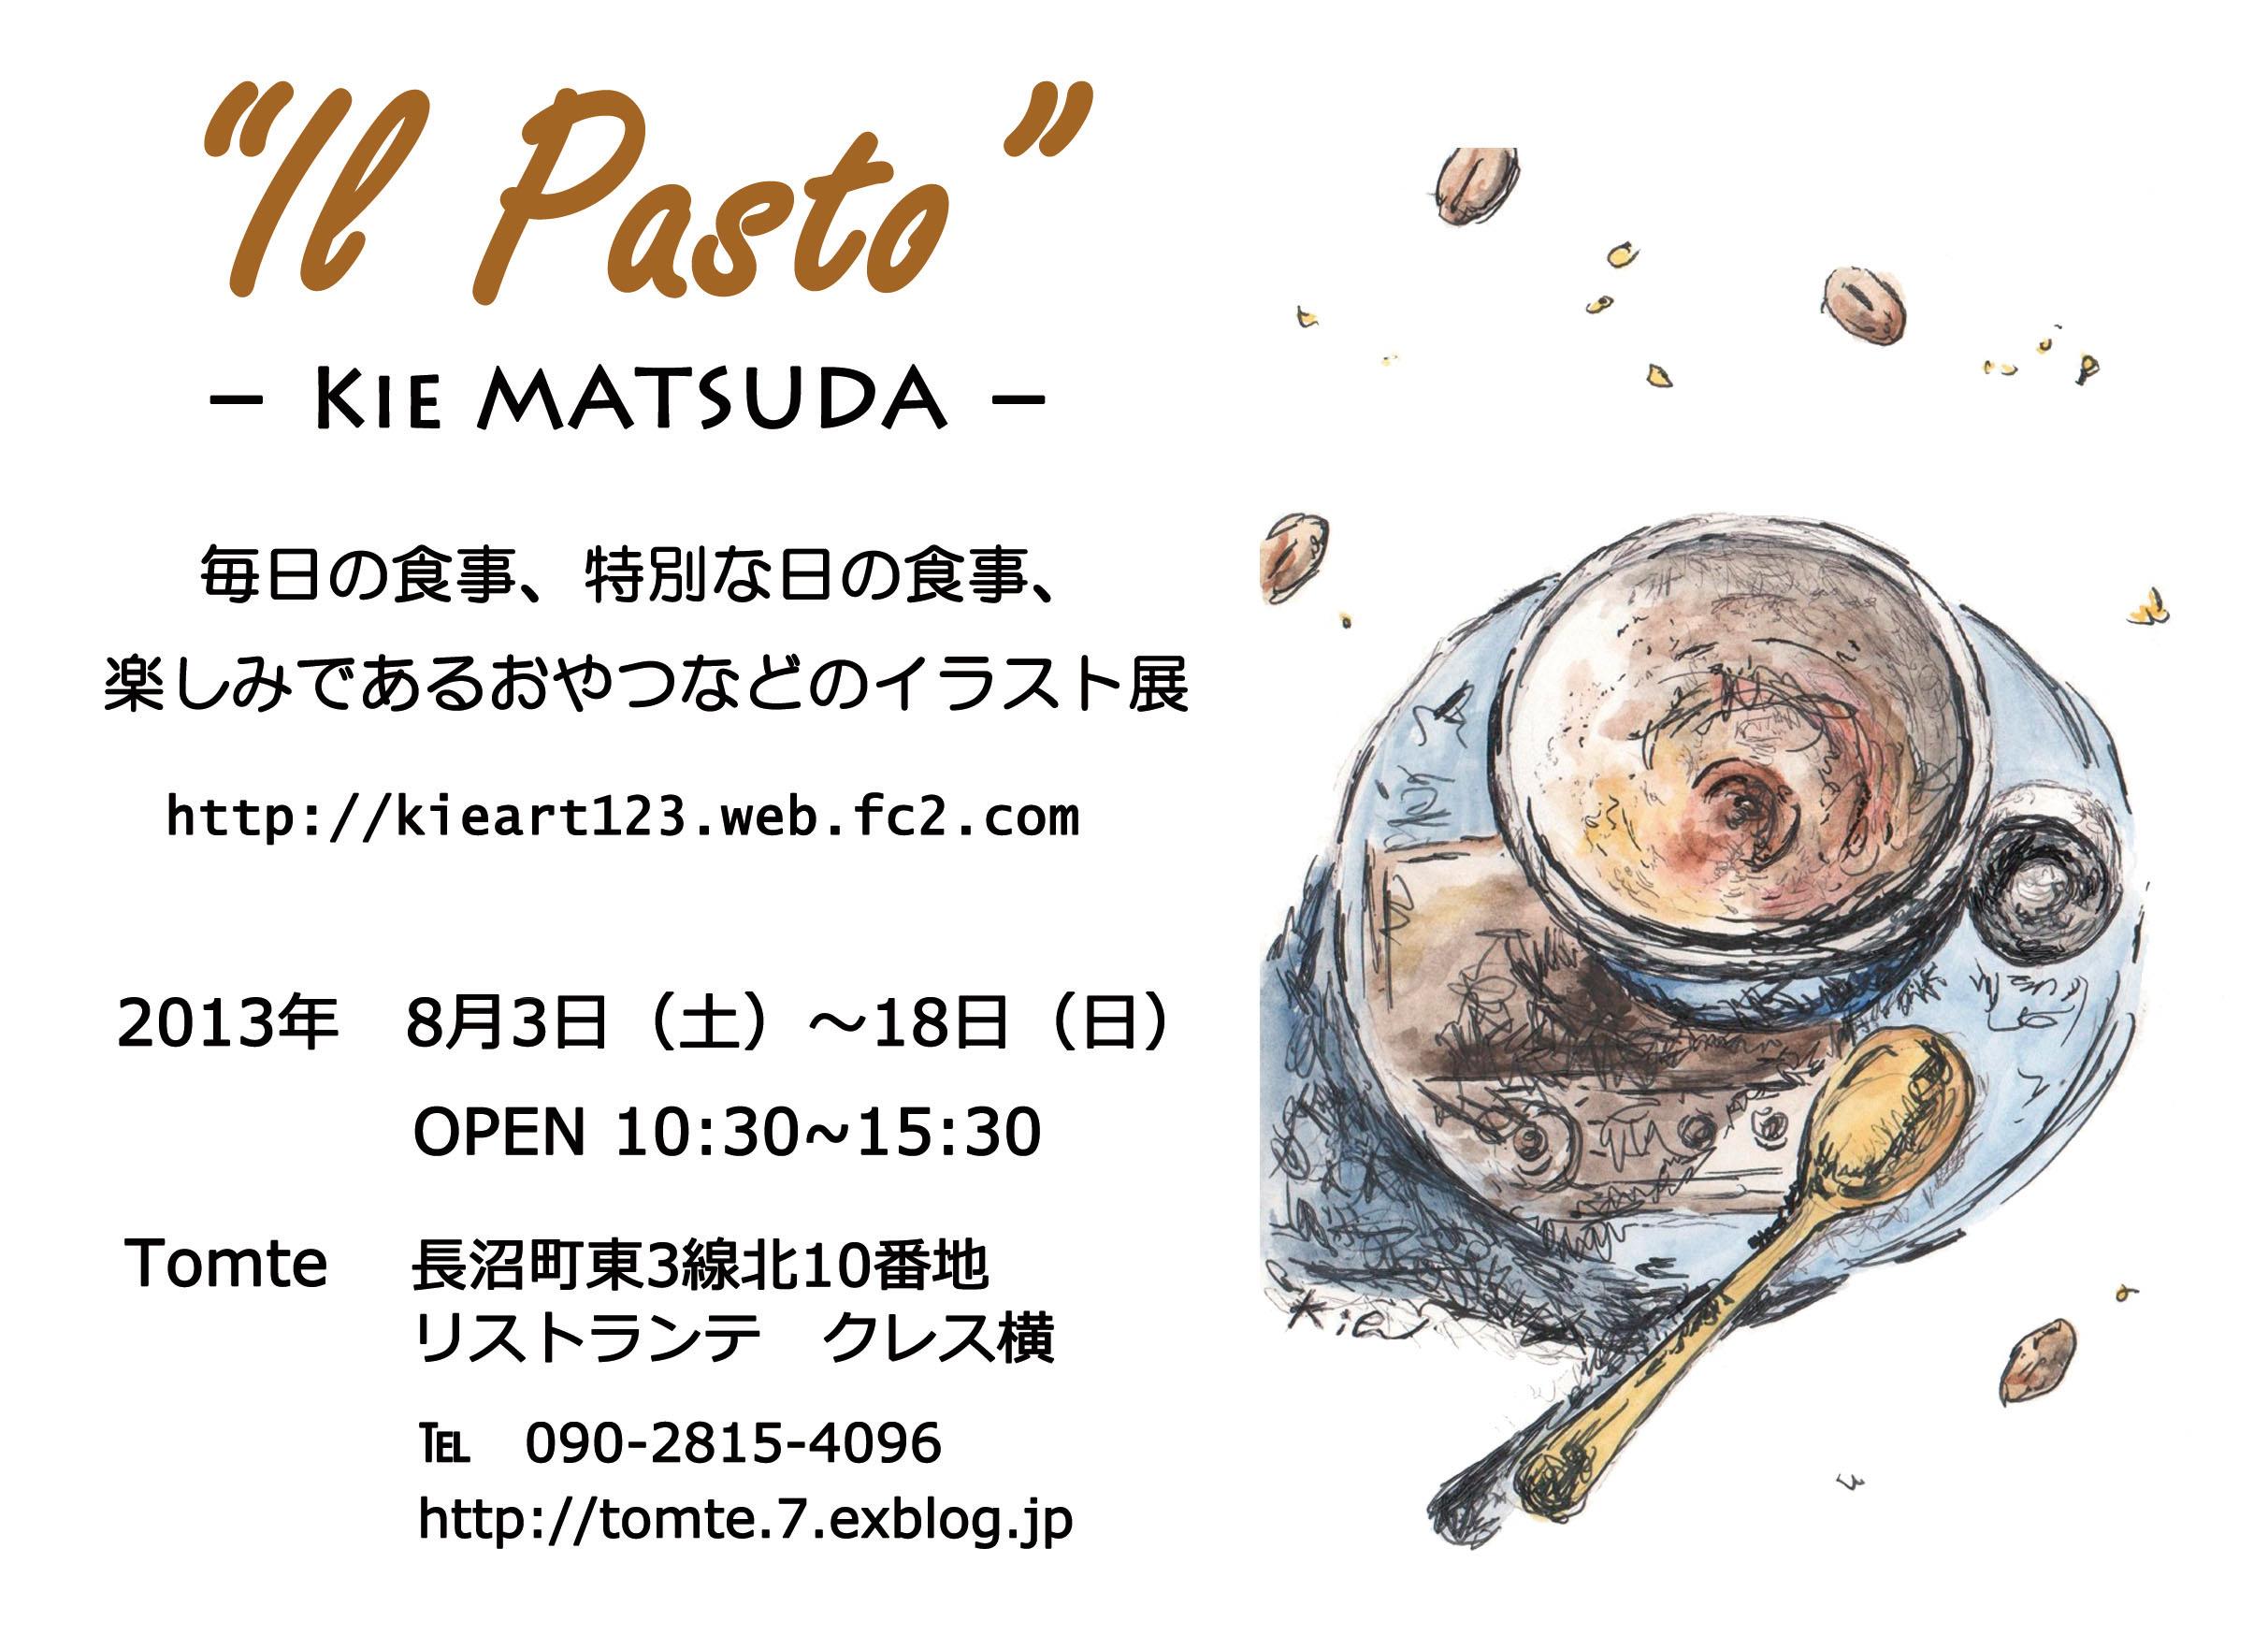 Il Pasto / Hokkaido